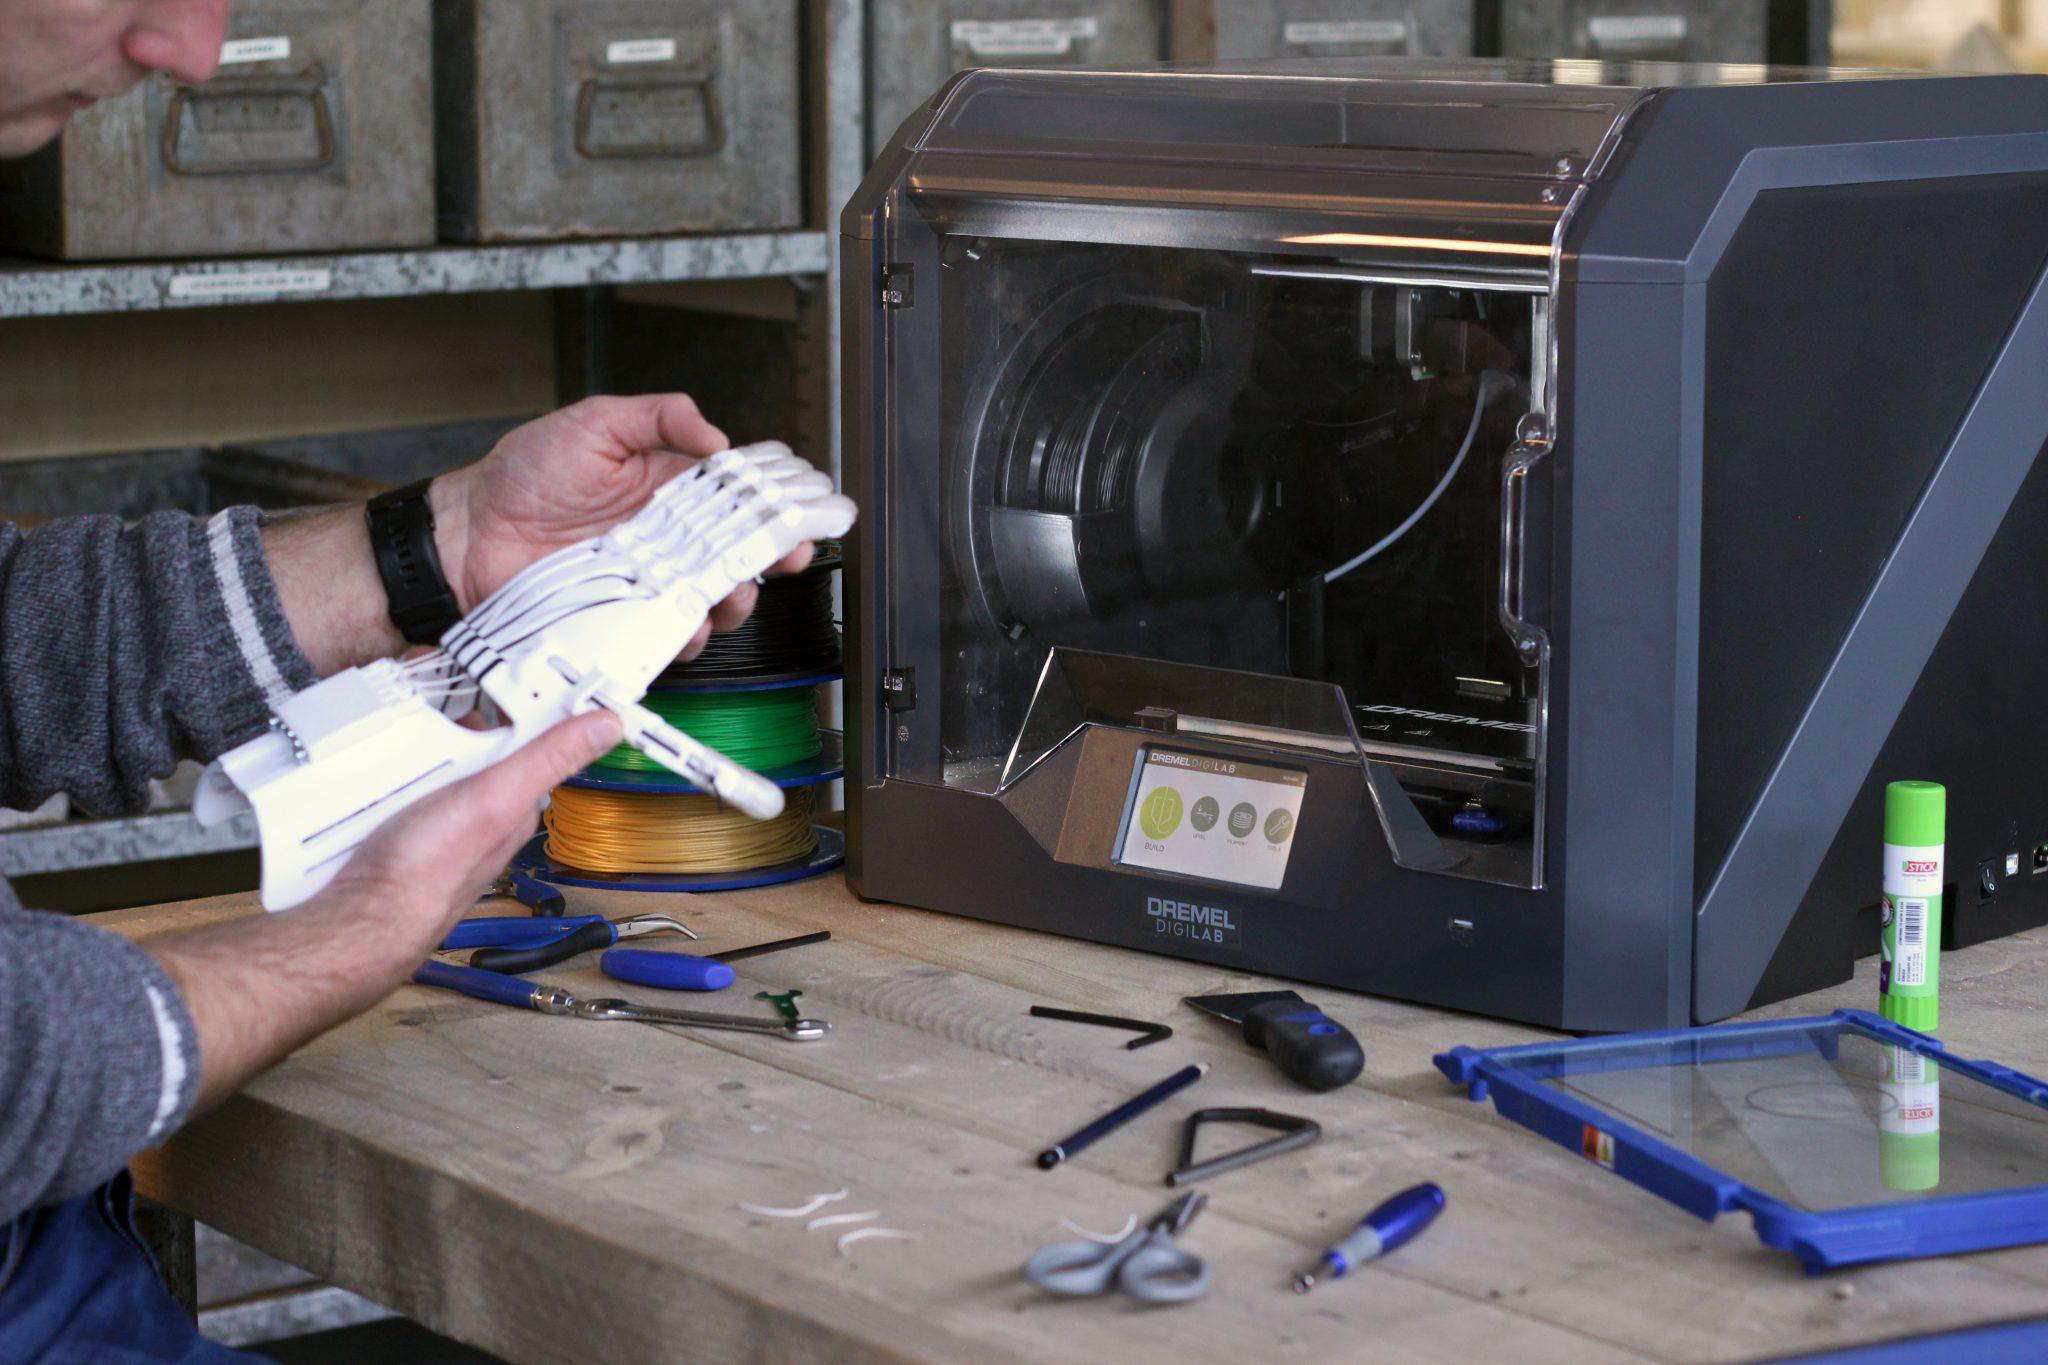 3D printing a mechanical hand on the Dremel DigiLab 3D printer. Photo via Dremel.